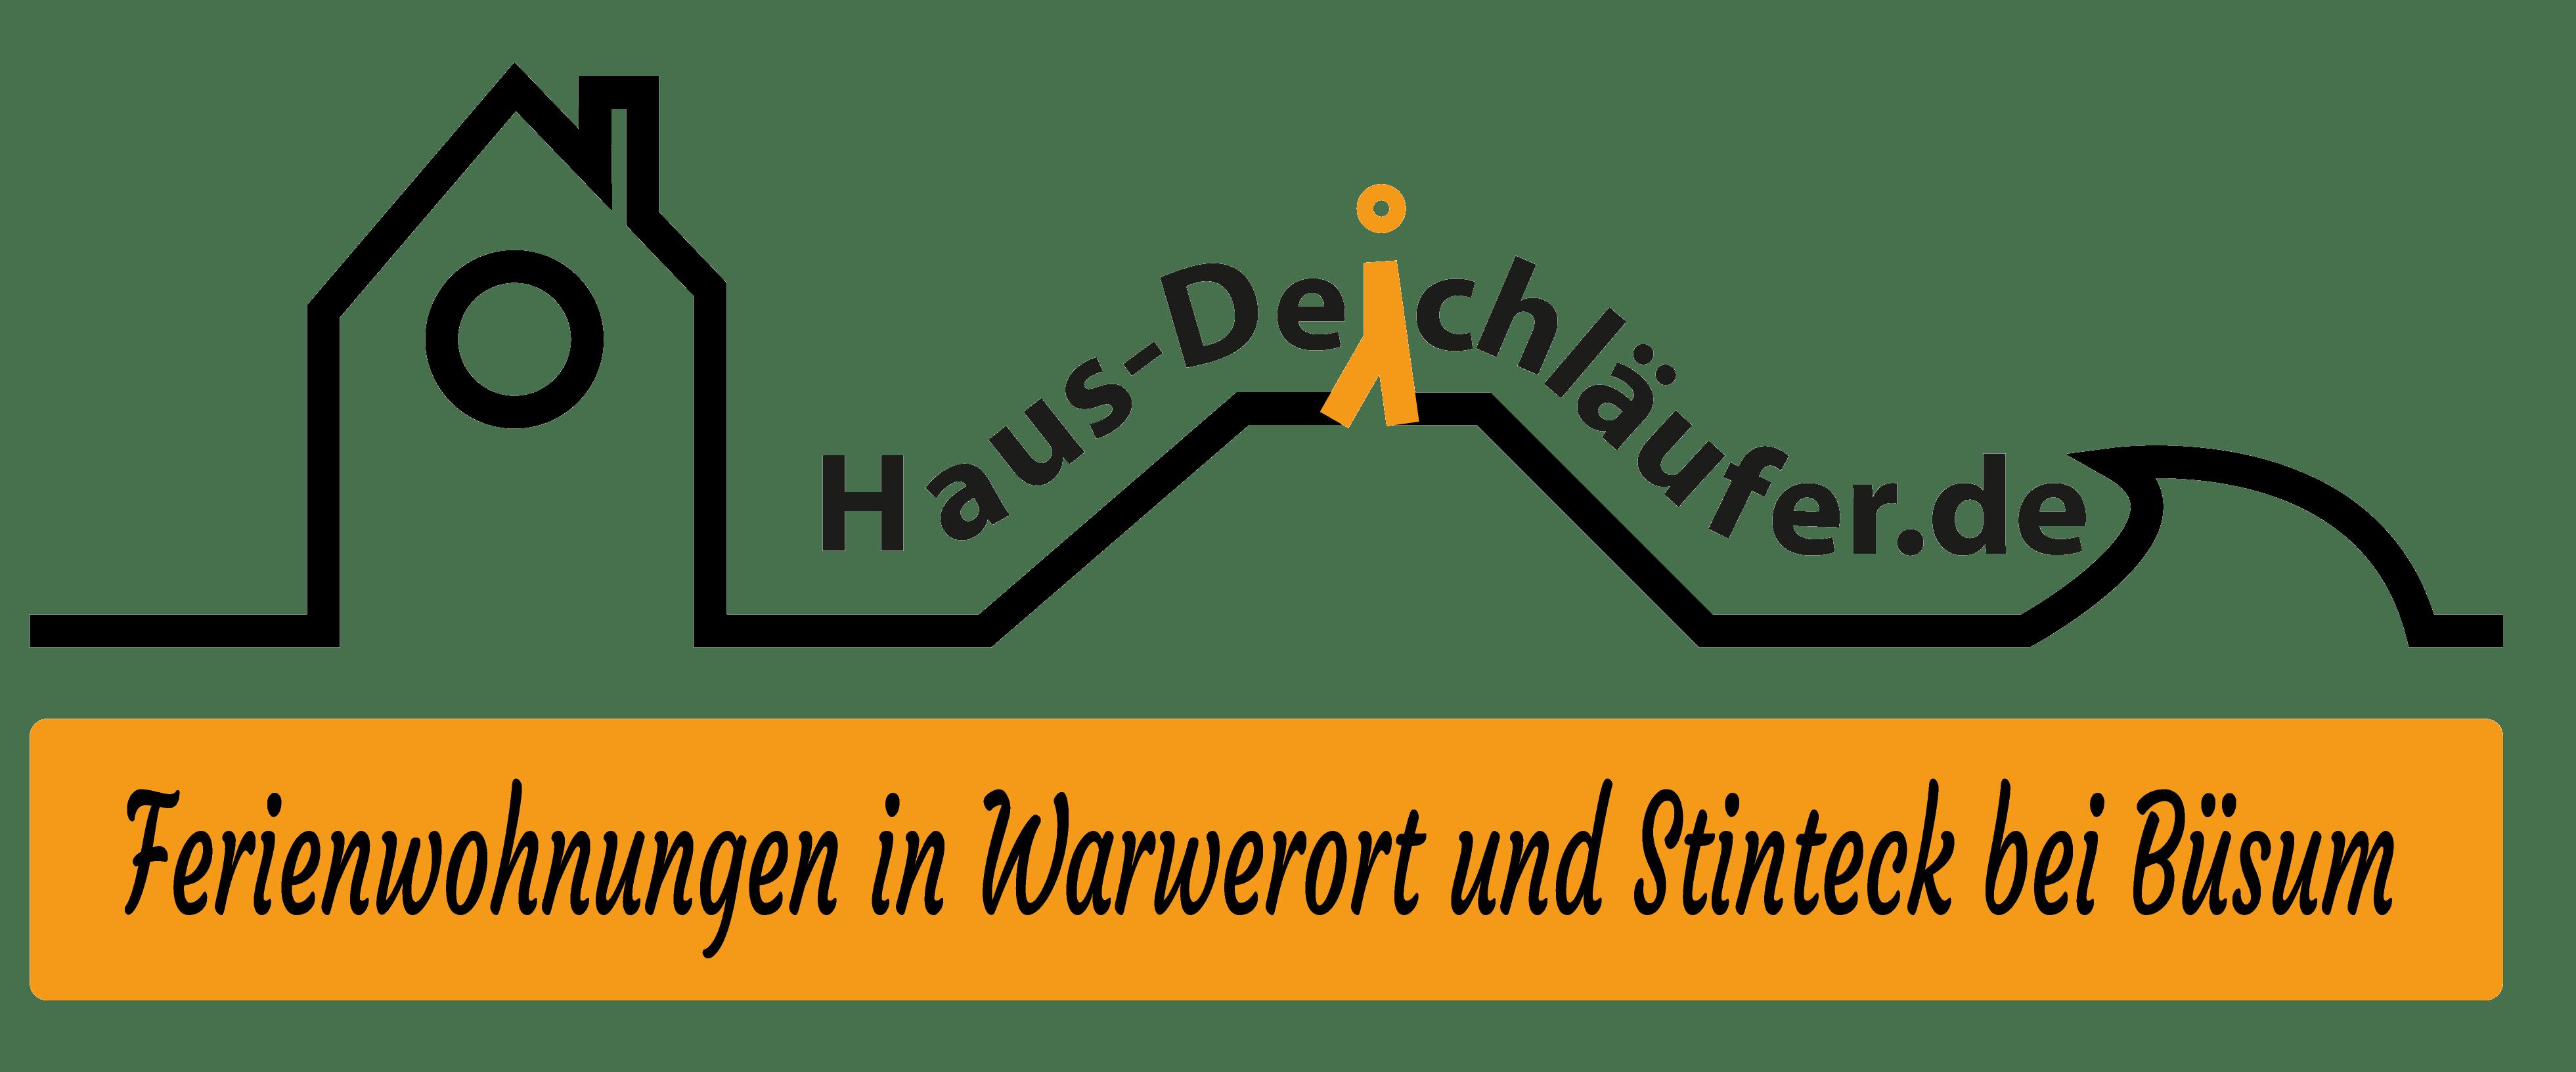 Logo_Haus-Deichlaeufer-DE_HGtrans_V8_3922x1632